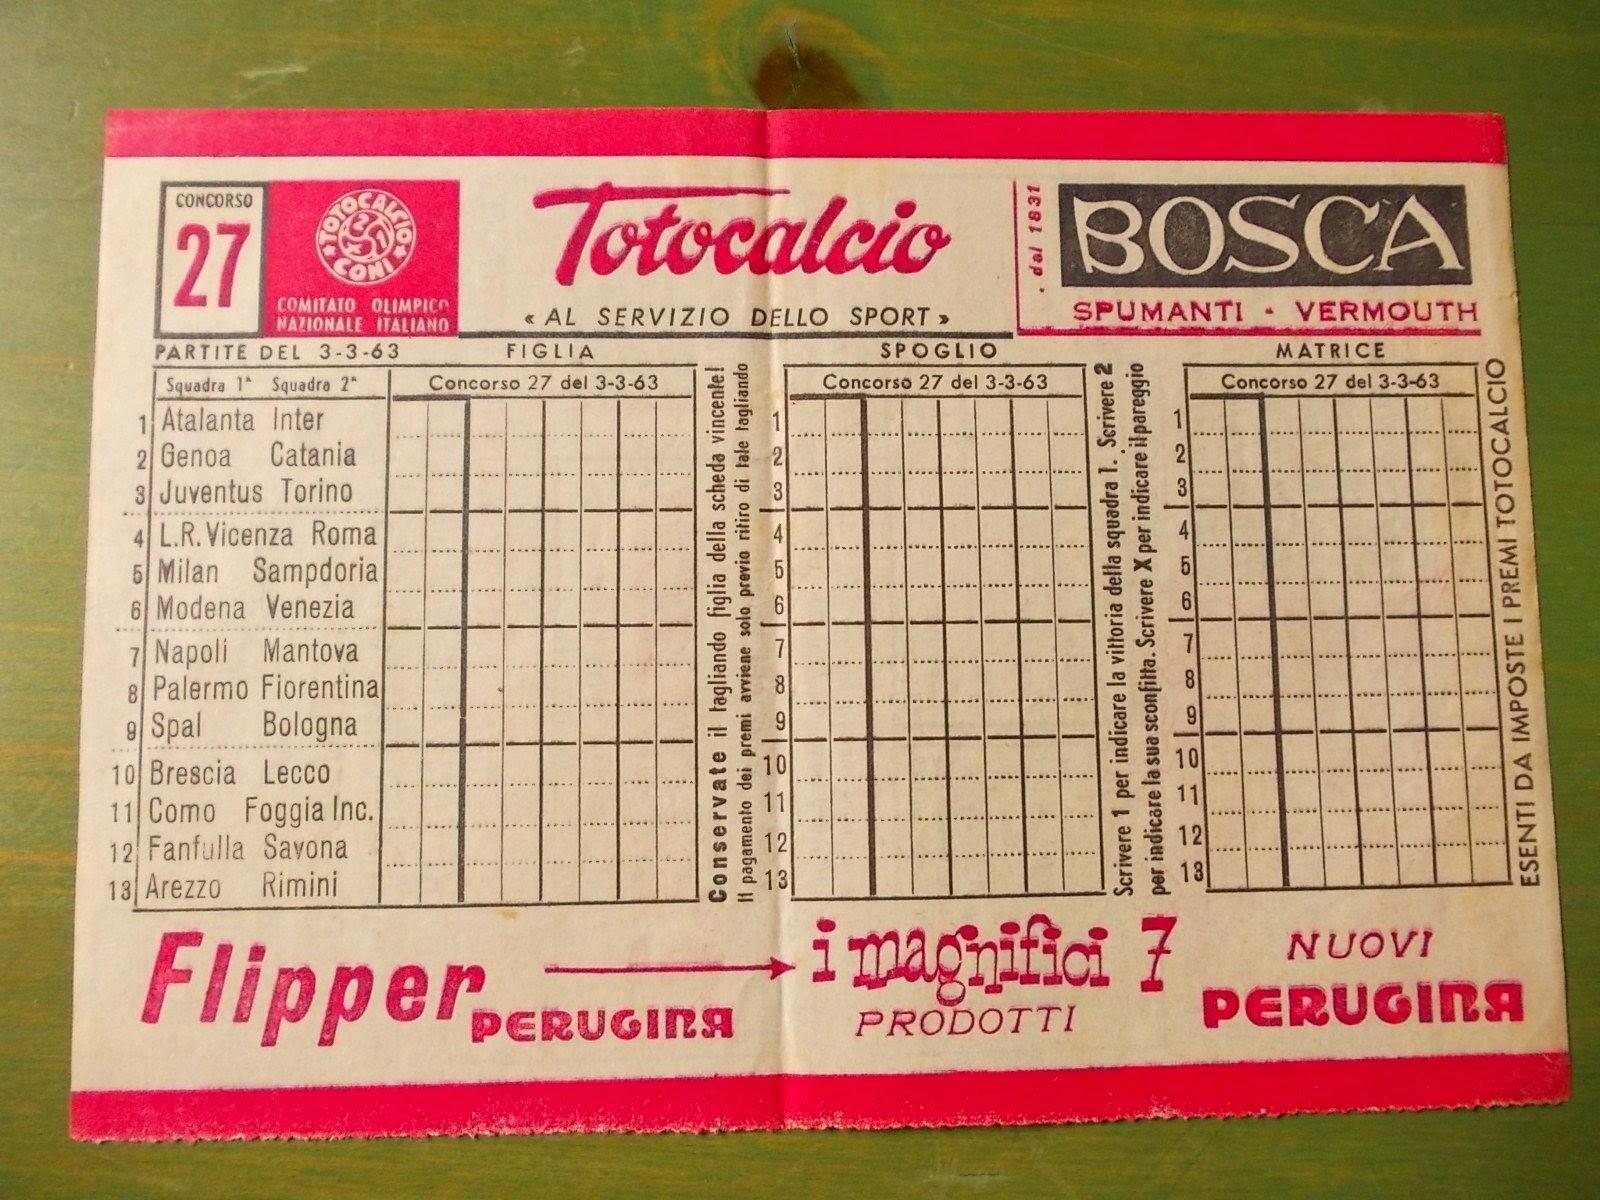 http://www.ebay.it/itm/SCHEDINA-TOTOCALCIO-CONCORSO-27-del-3-3-1963-schedine-vintage-/321252132792